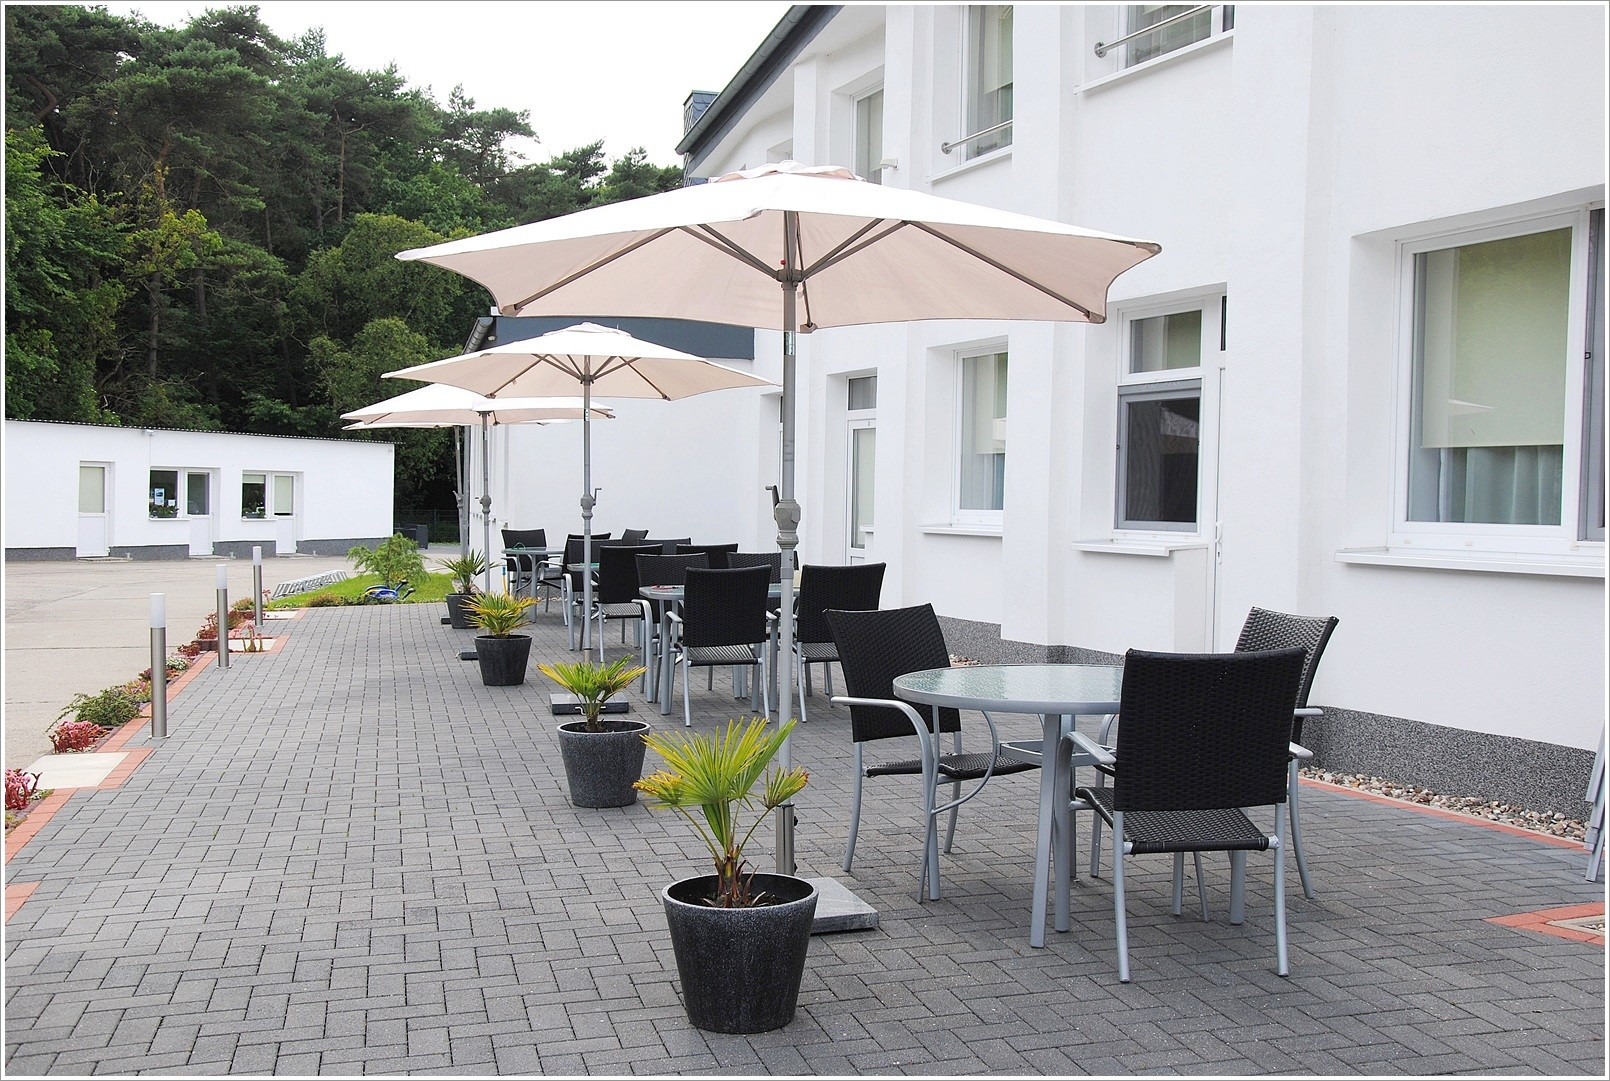 Terrasse / Eingang - Weiße Möwe